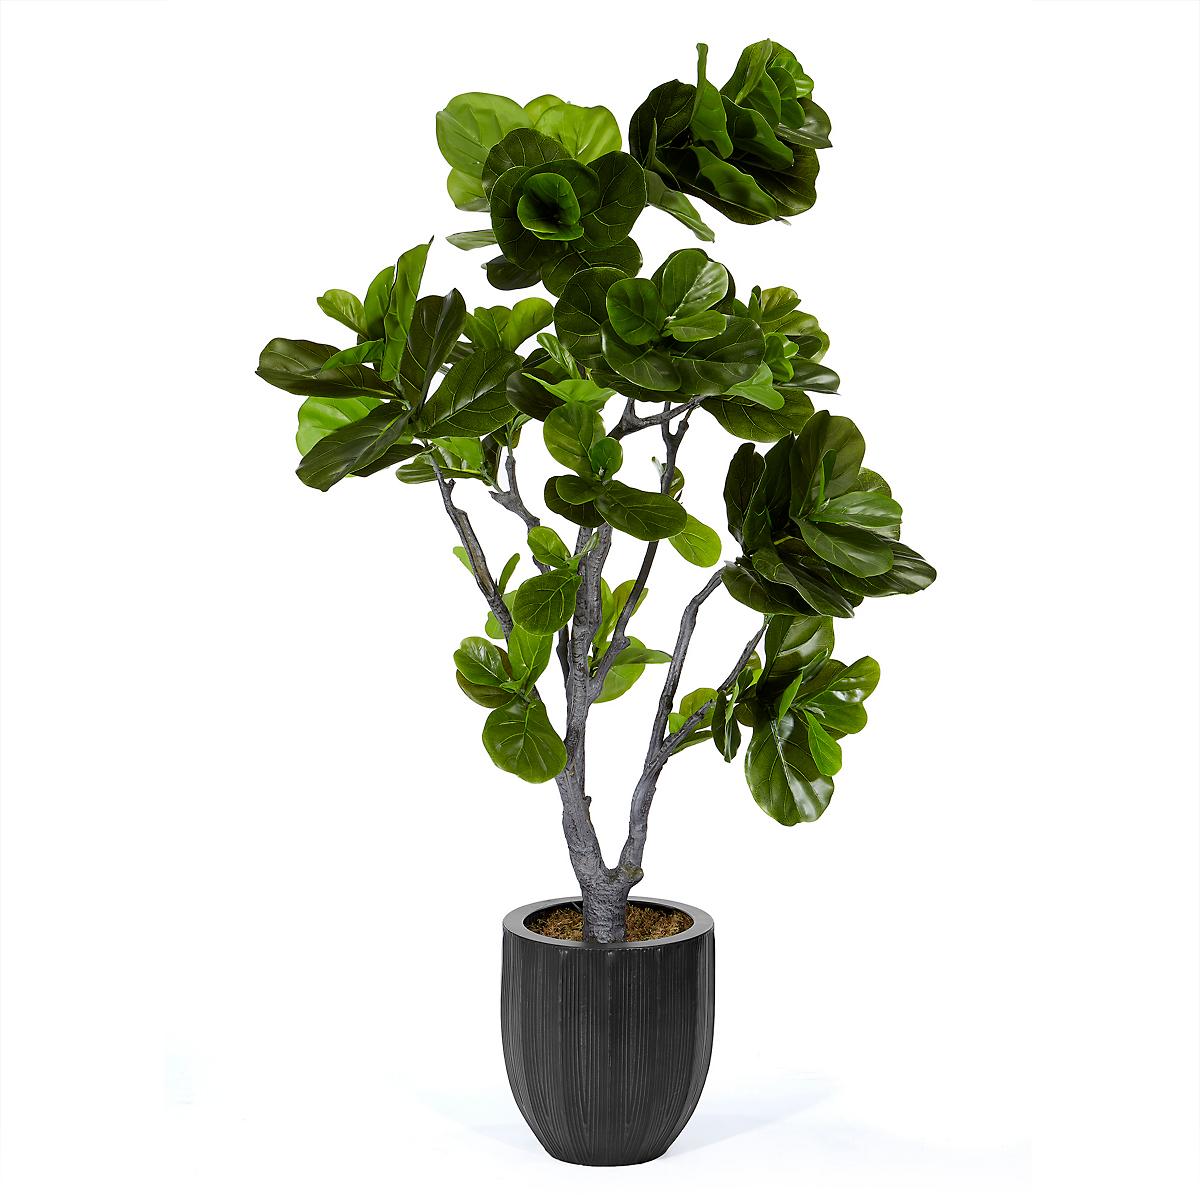 fiddleleaf fig tree